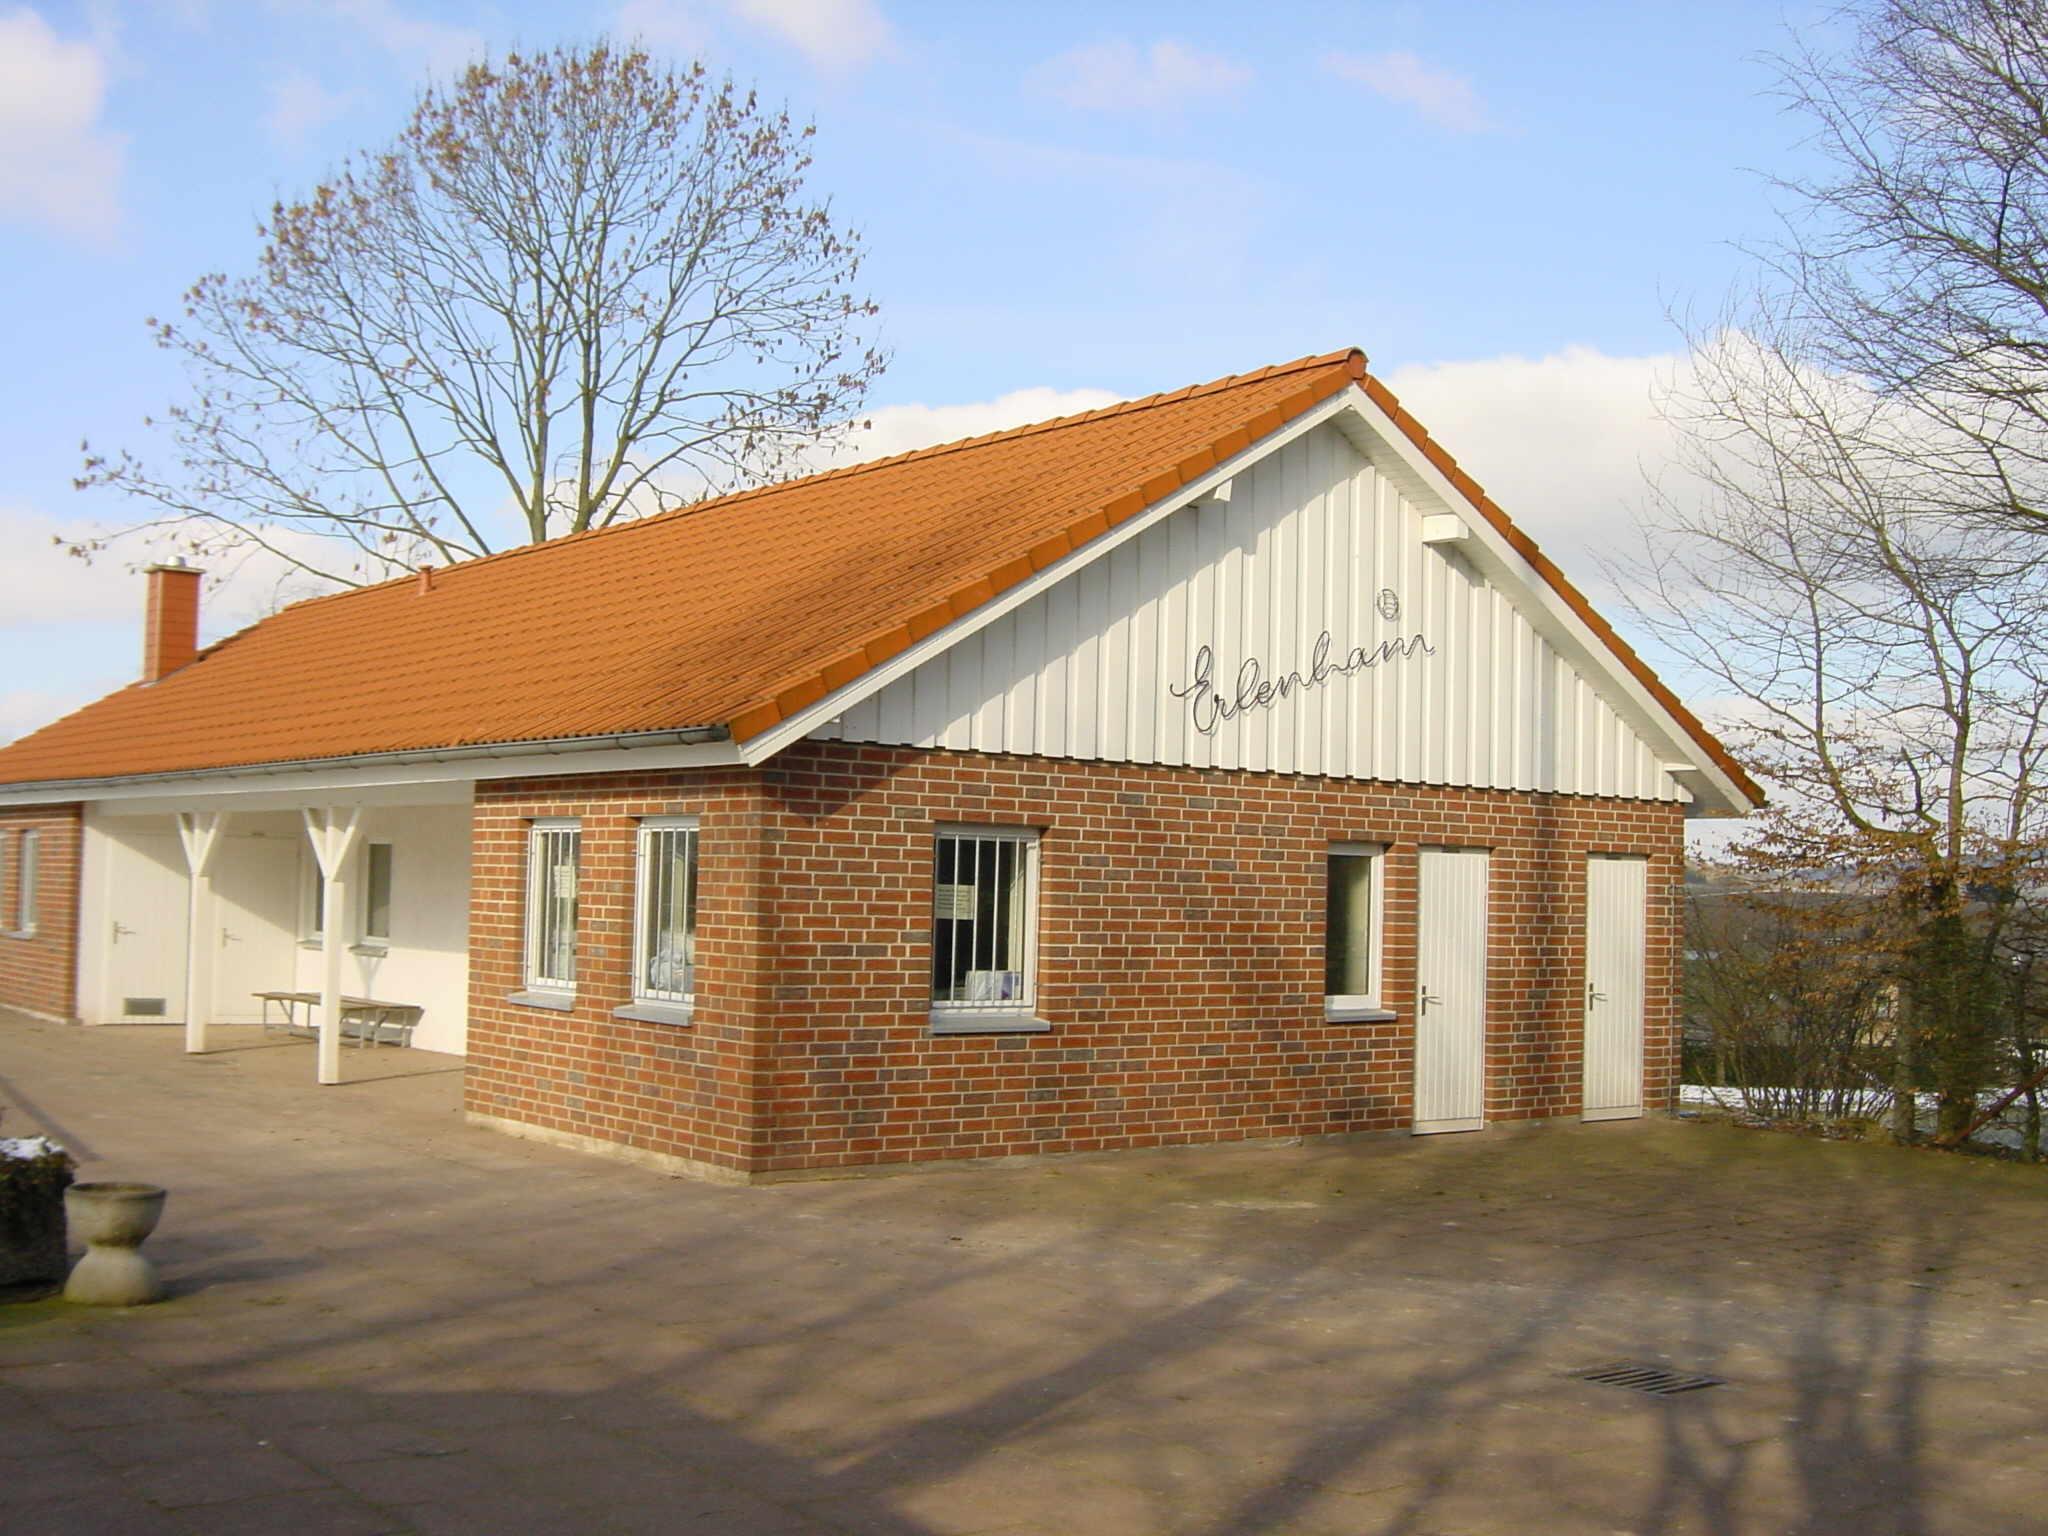 Tus Sporthaus